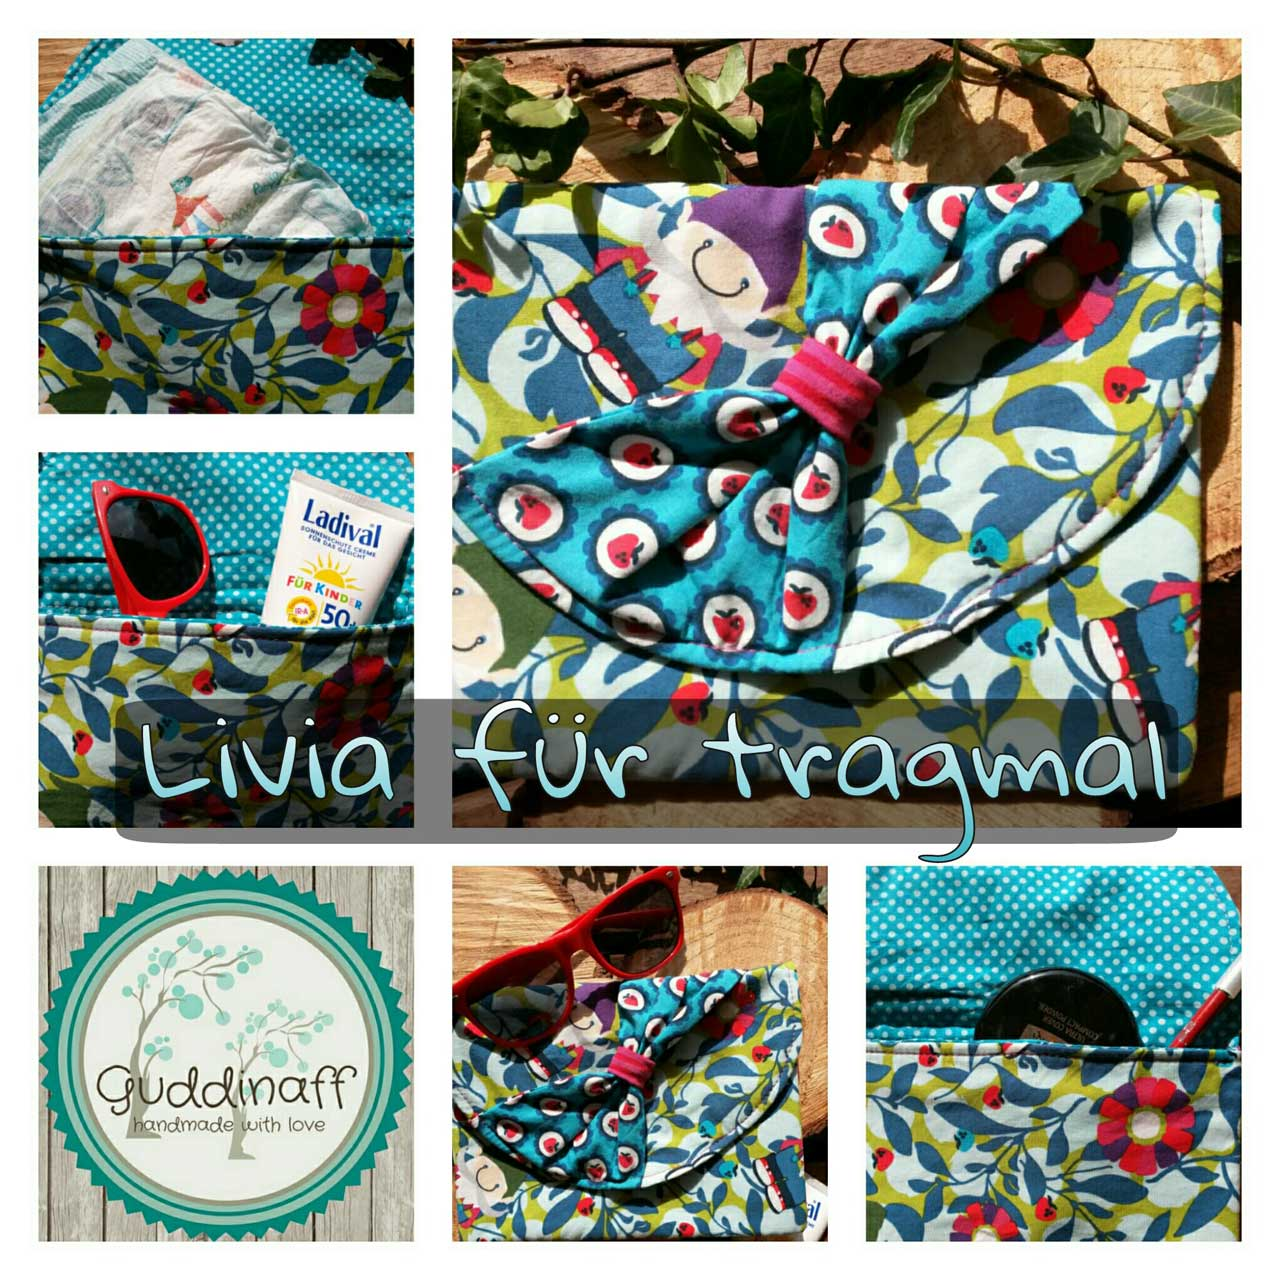 tragmal, Livia